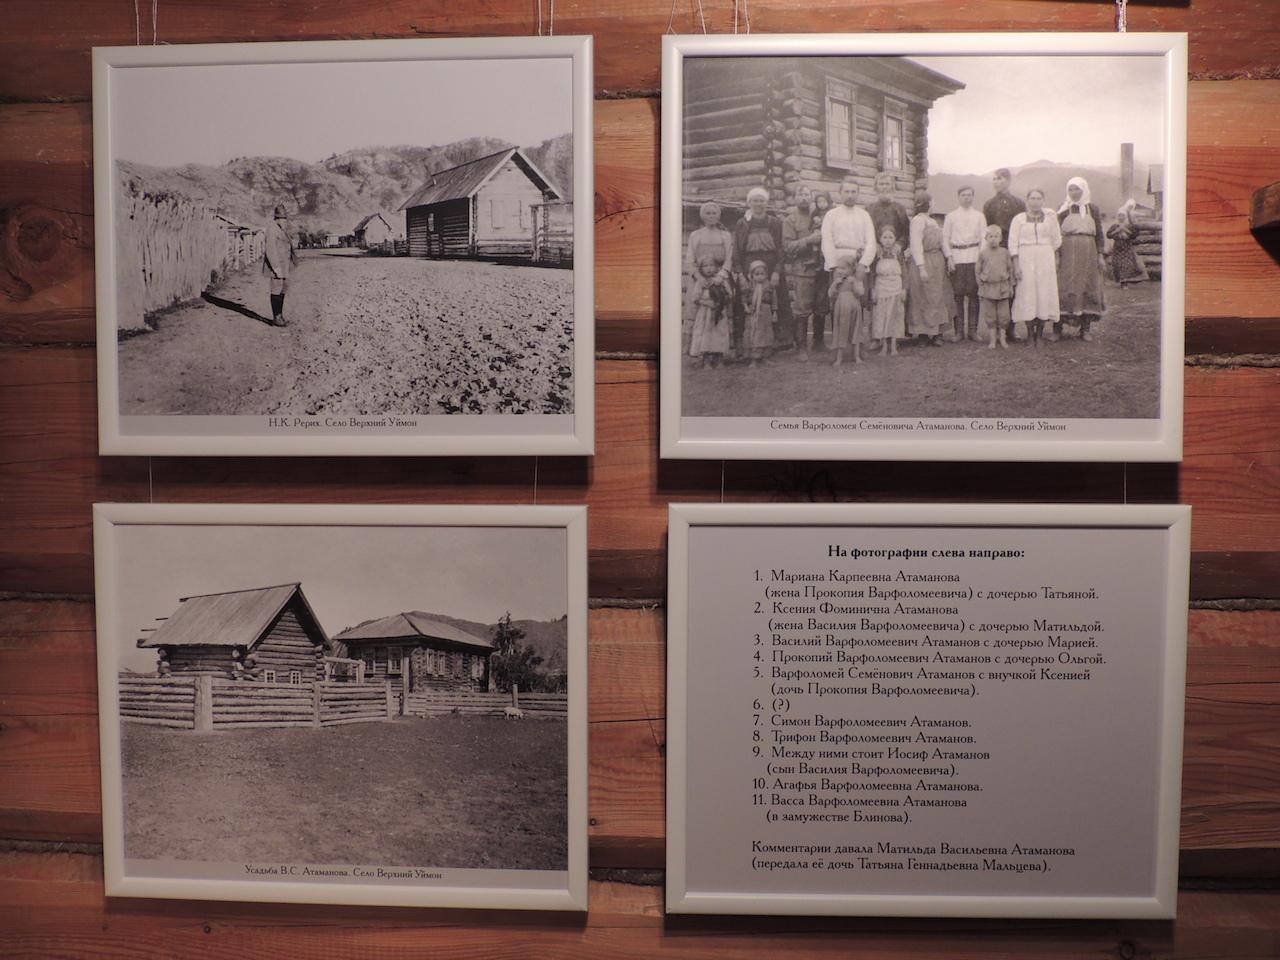 Верхний Уймон Мемориальный музей Рериха 02 авг. 2015 г., 11-16.JPG